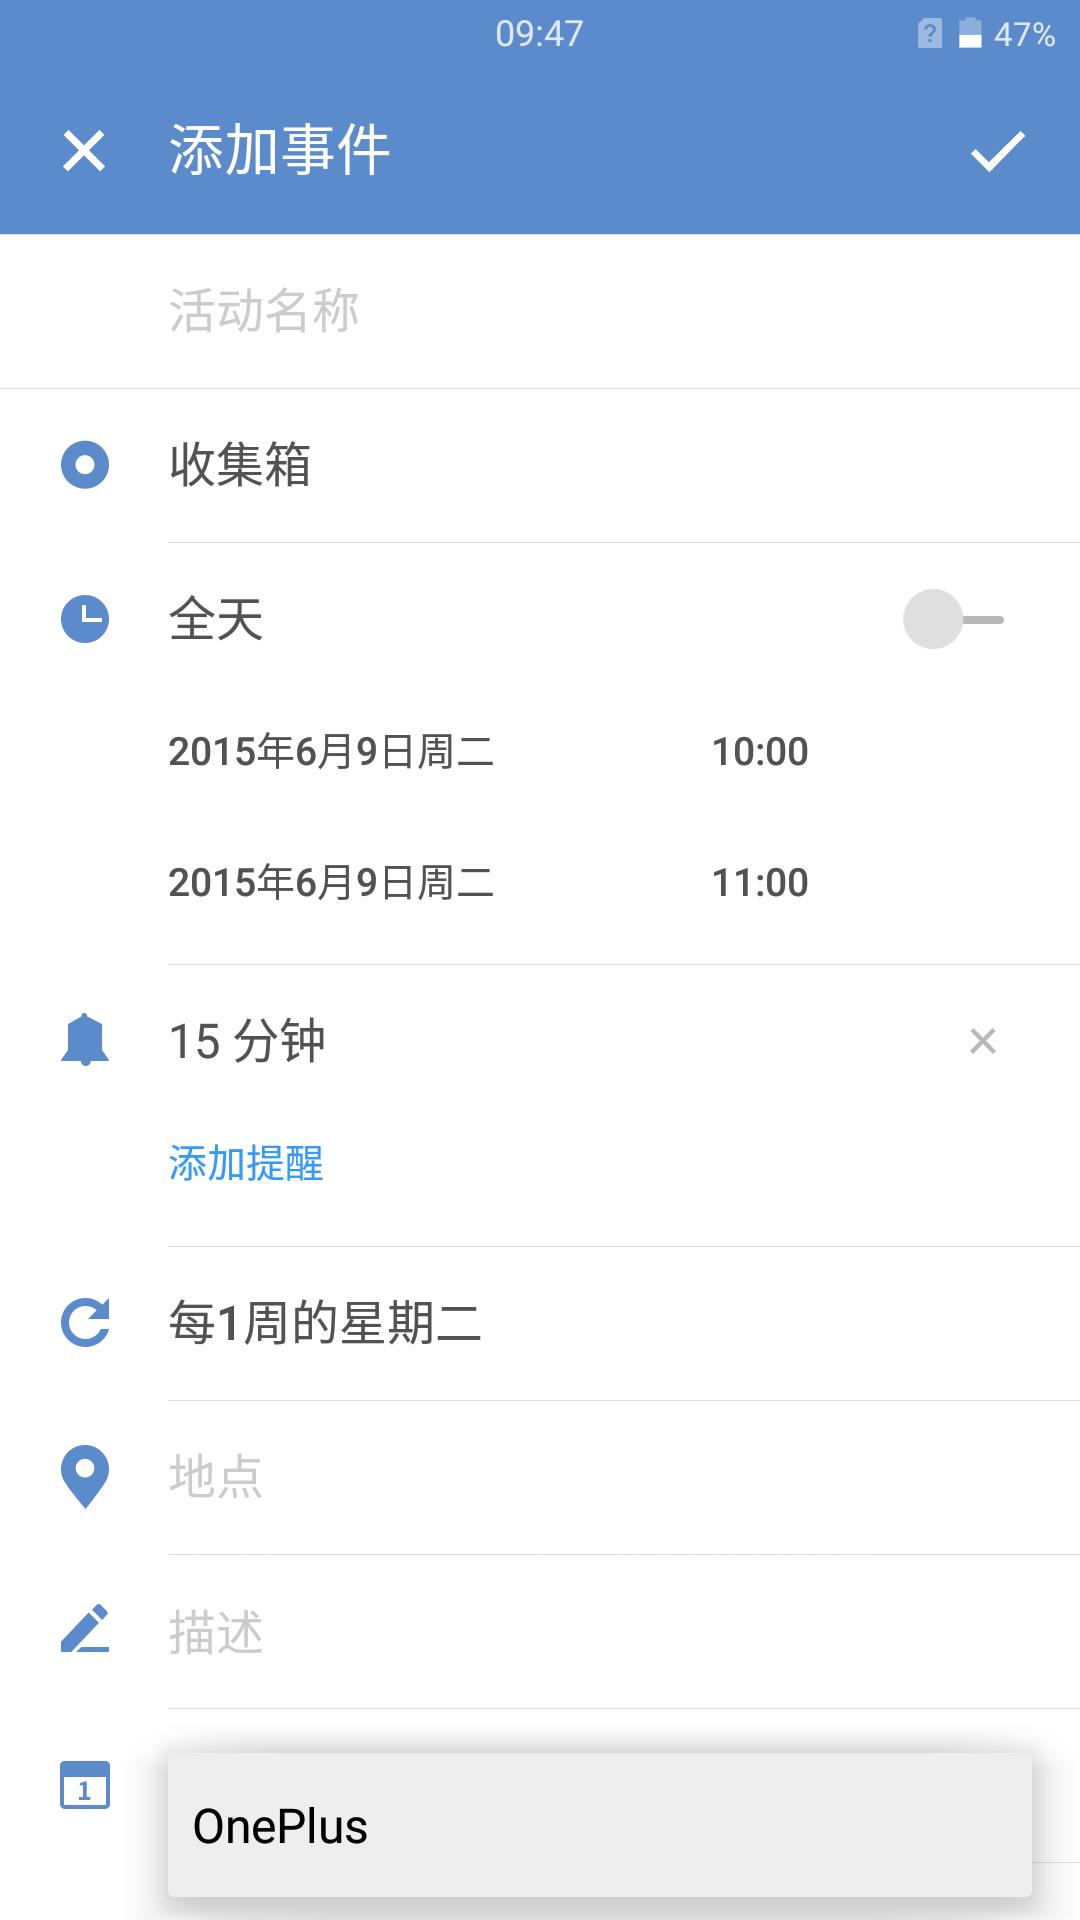 Screenshot_2015-06-09-09-47-03.png